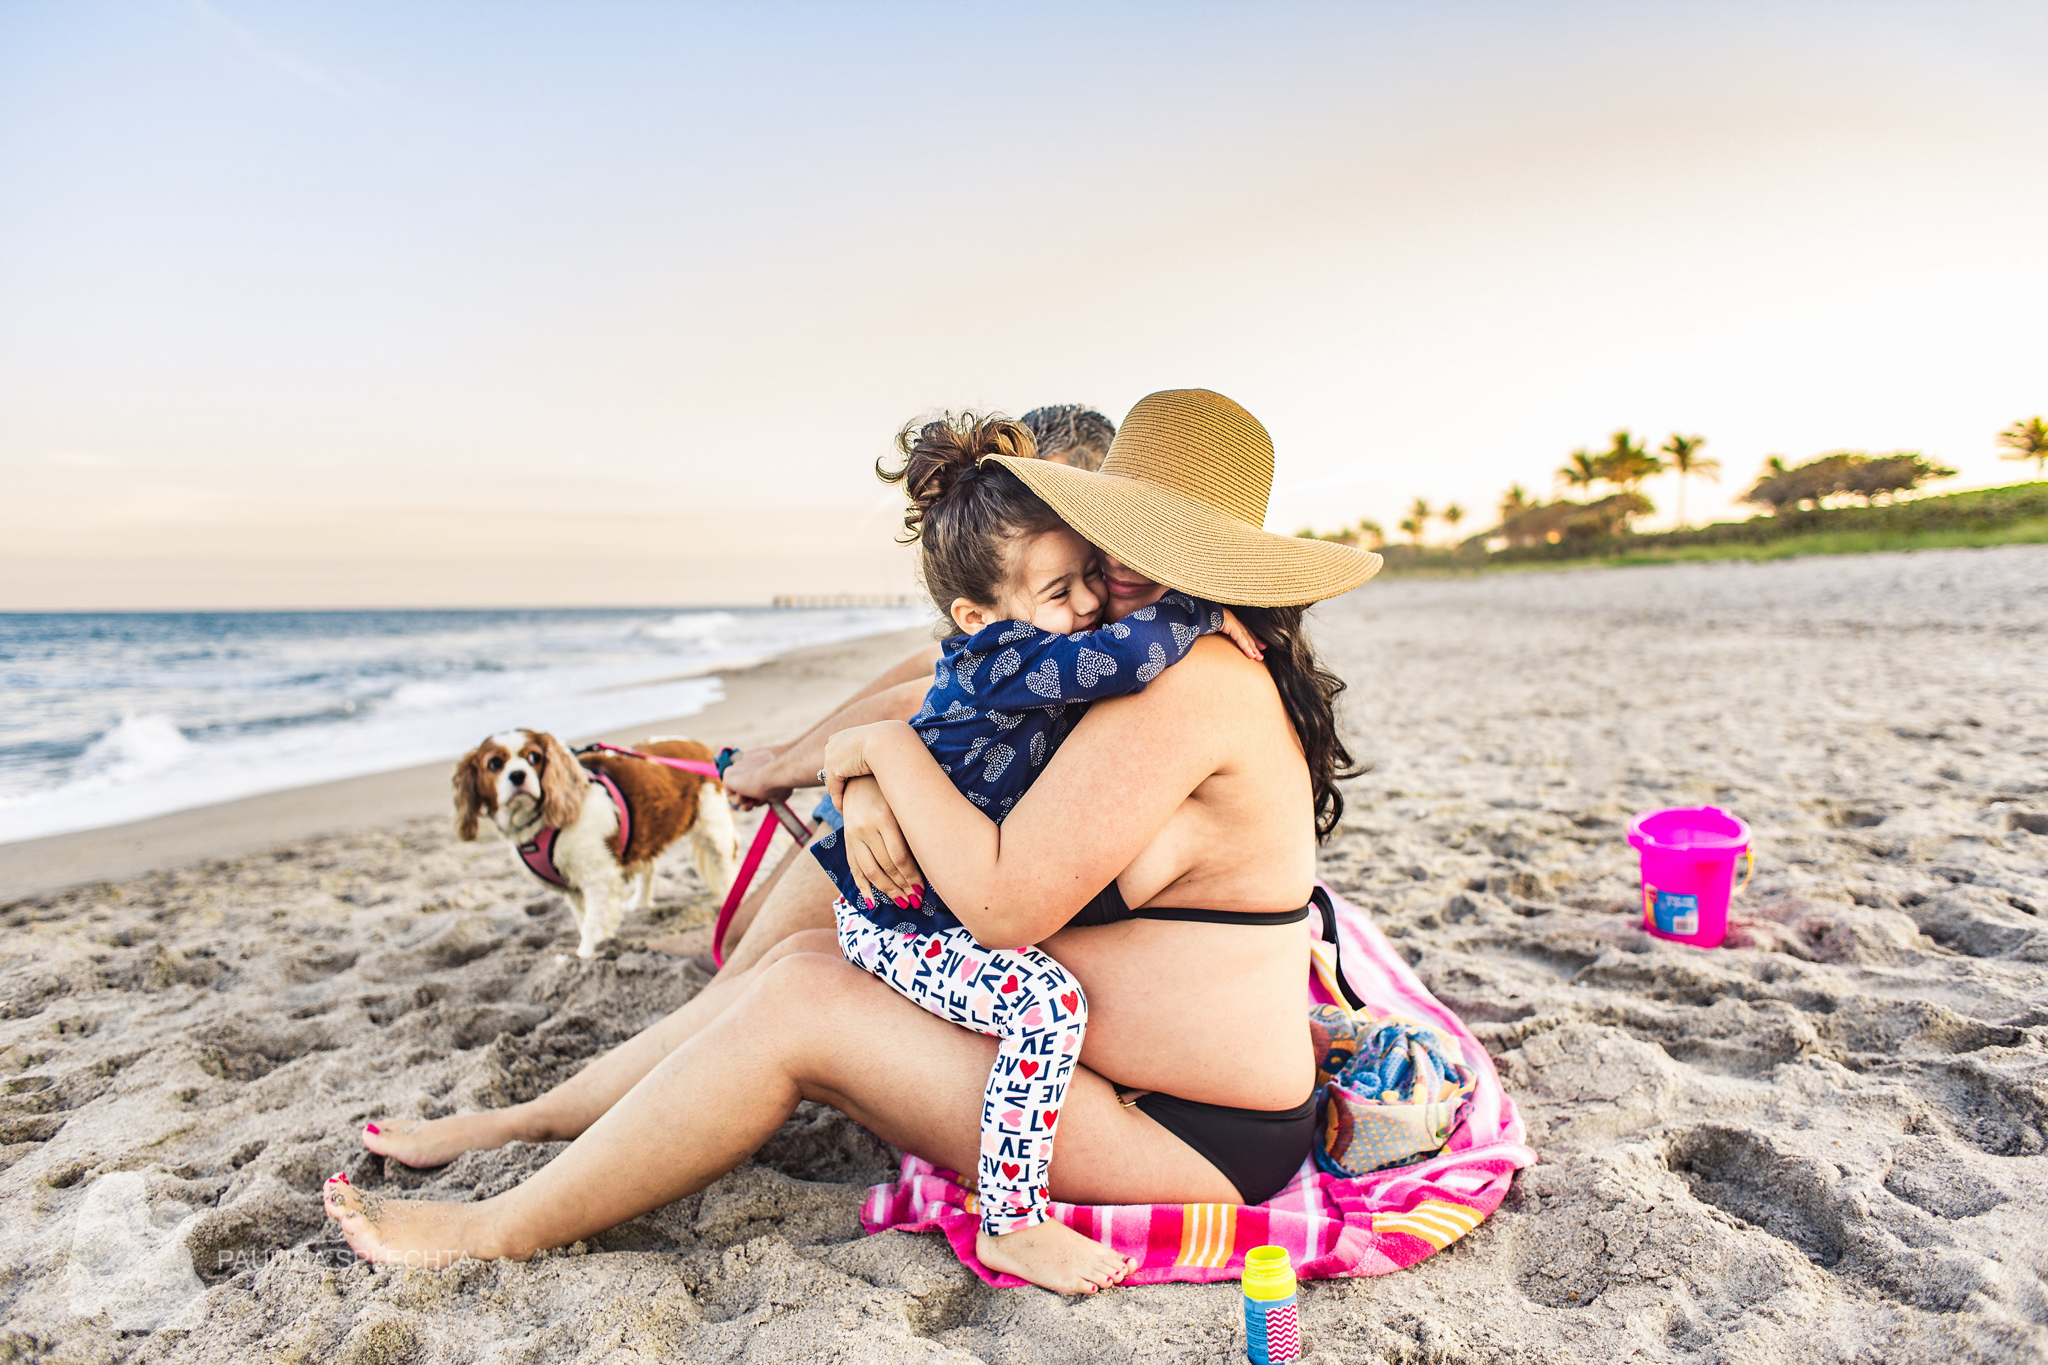 jupiter boca raton newborn maternity photos photographer south florida birth photography film videography-7.jpg